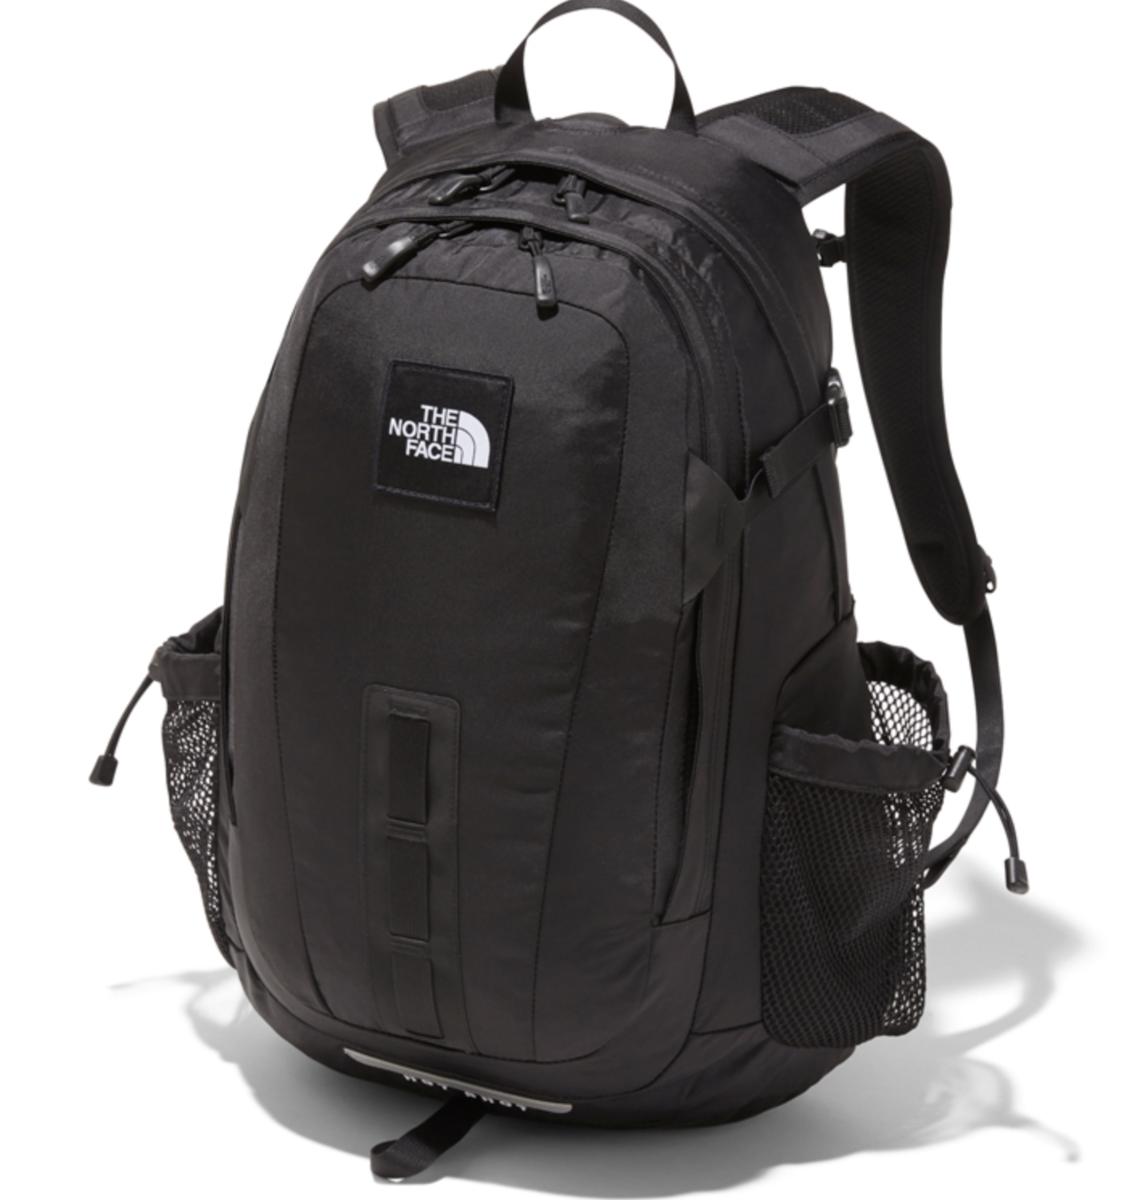 f:id:thebackpack:20191007201513p:plain